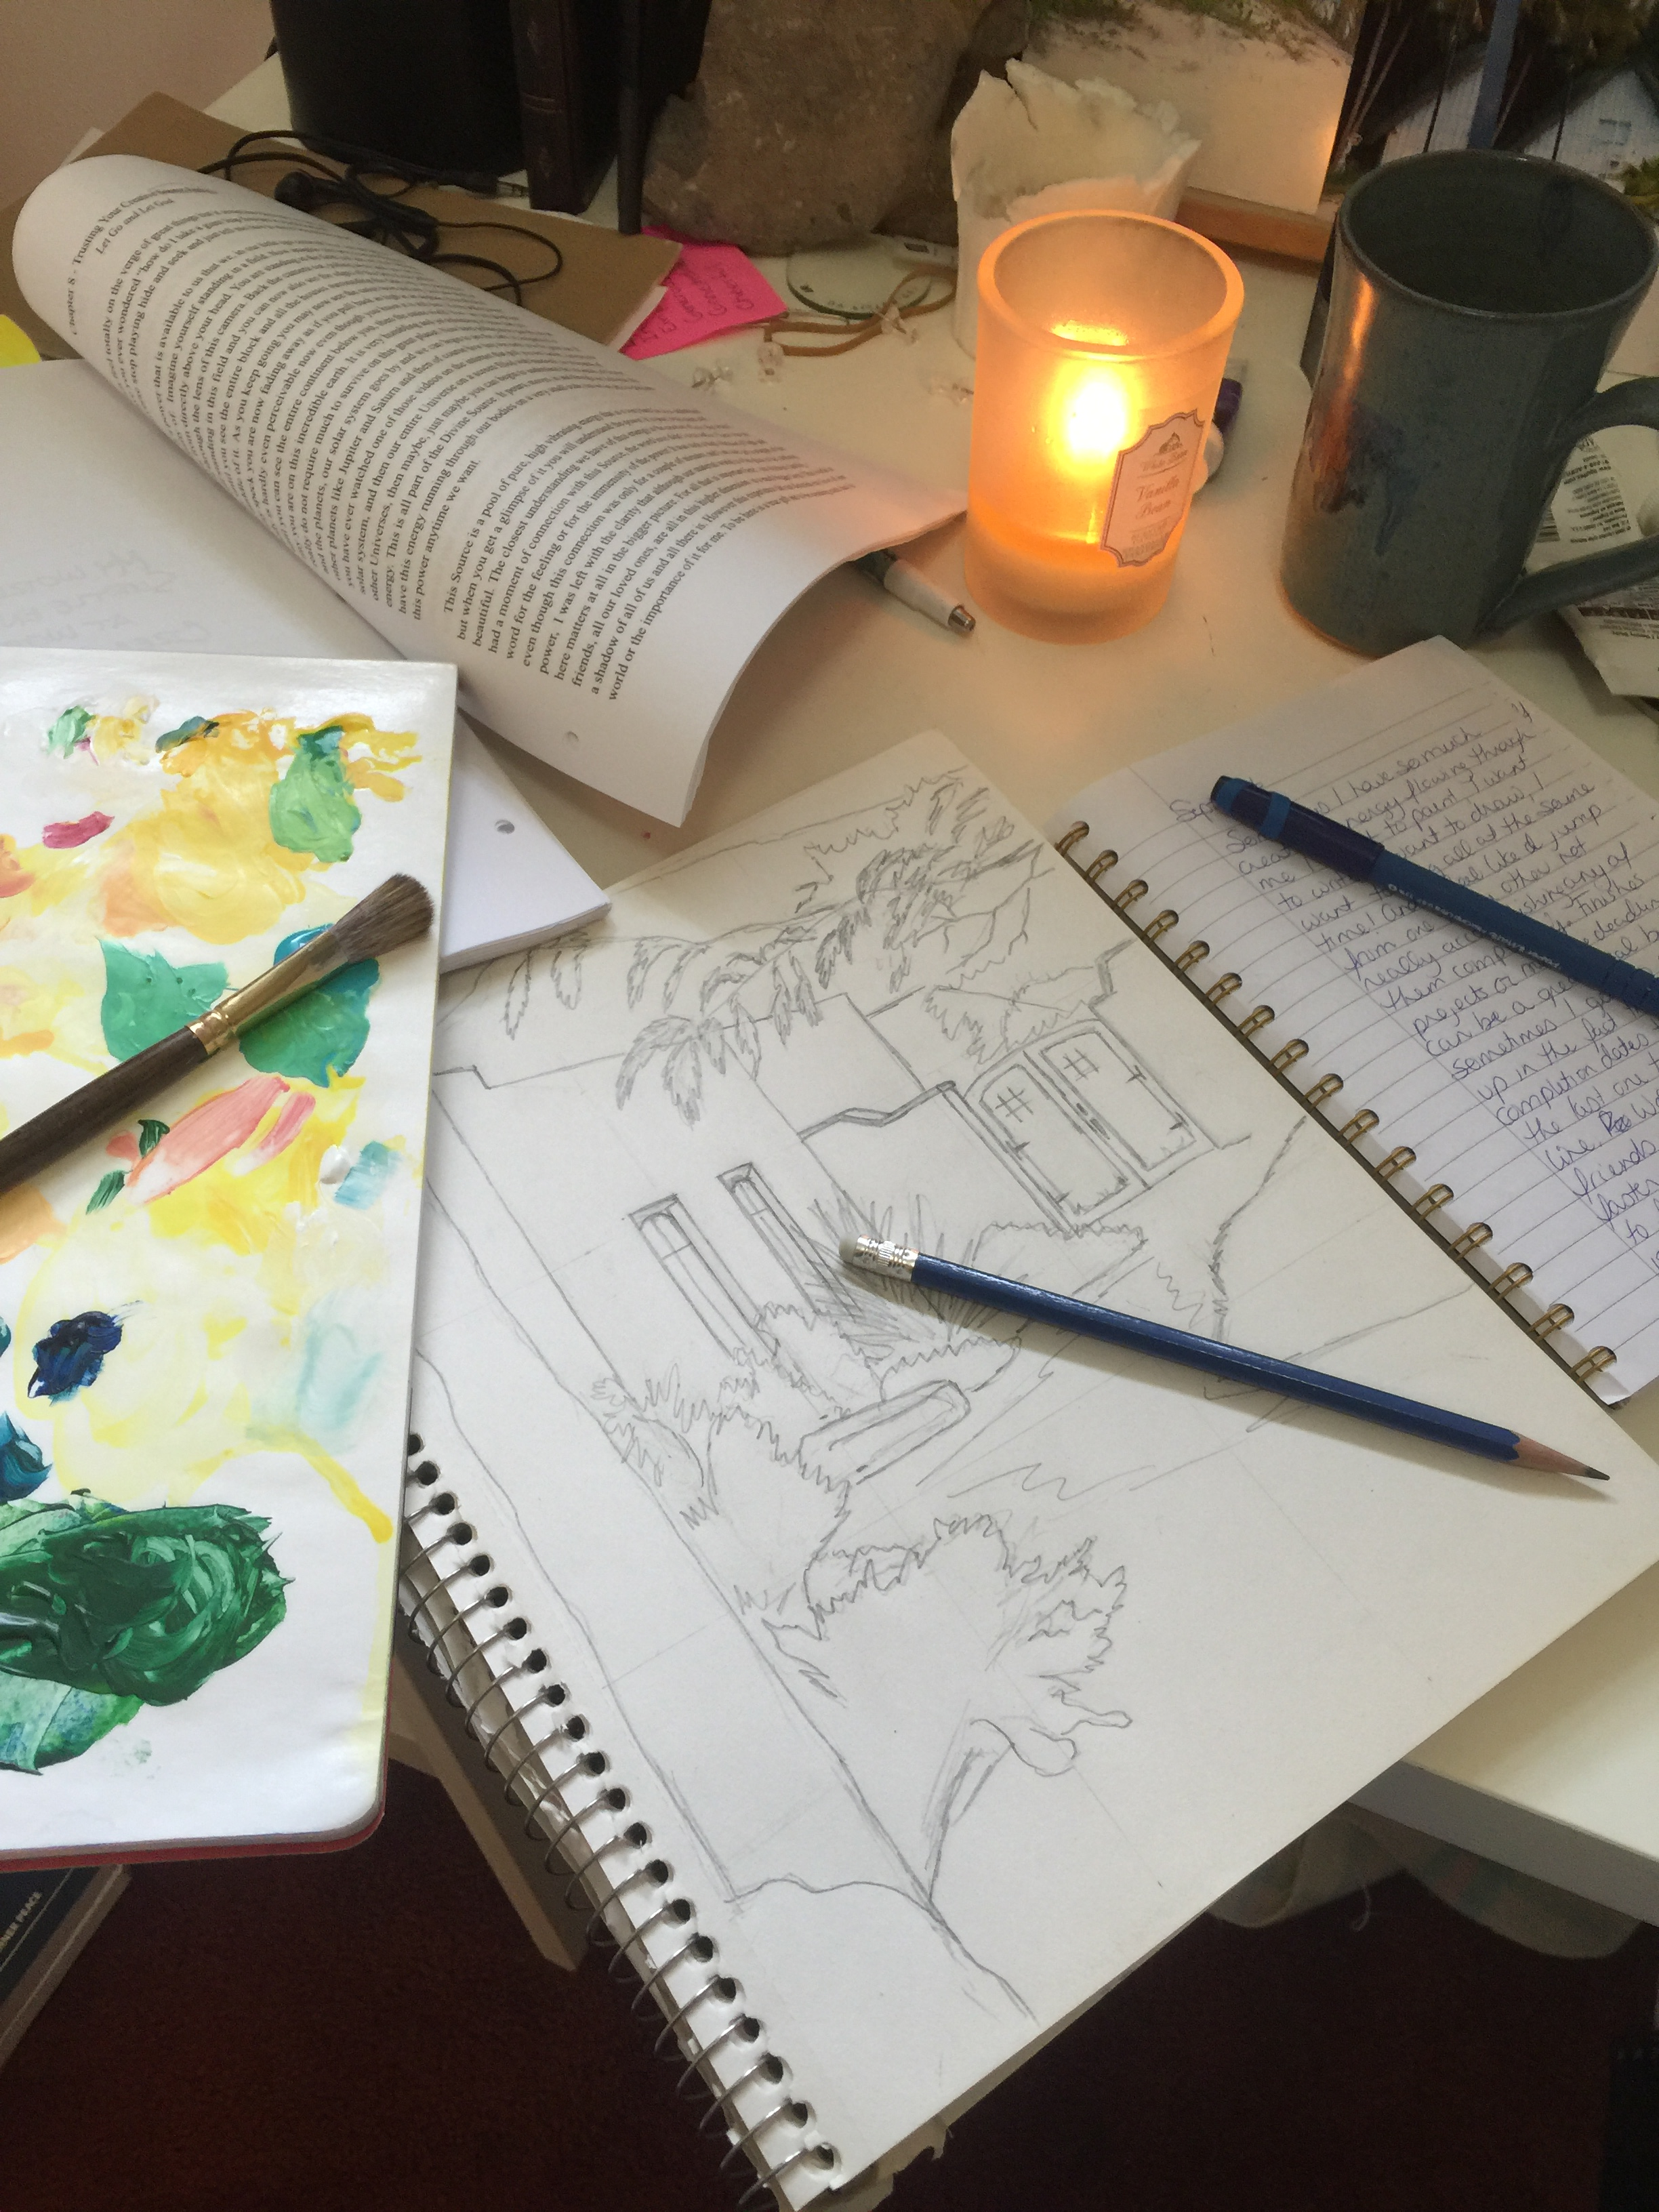 Creative Inspiration by Janice Gallant